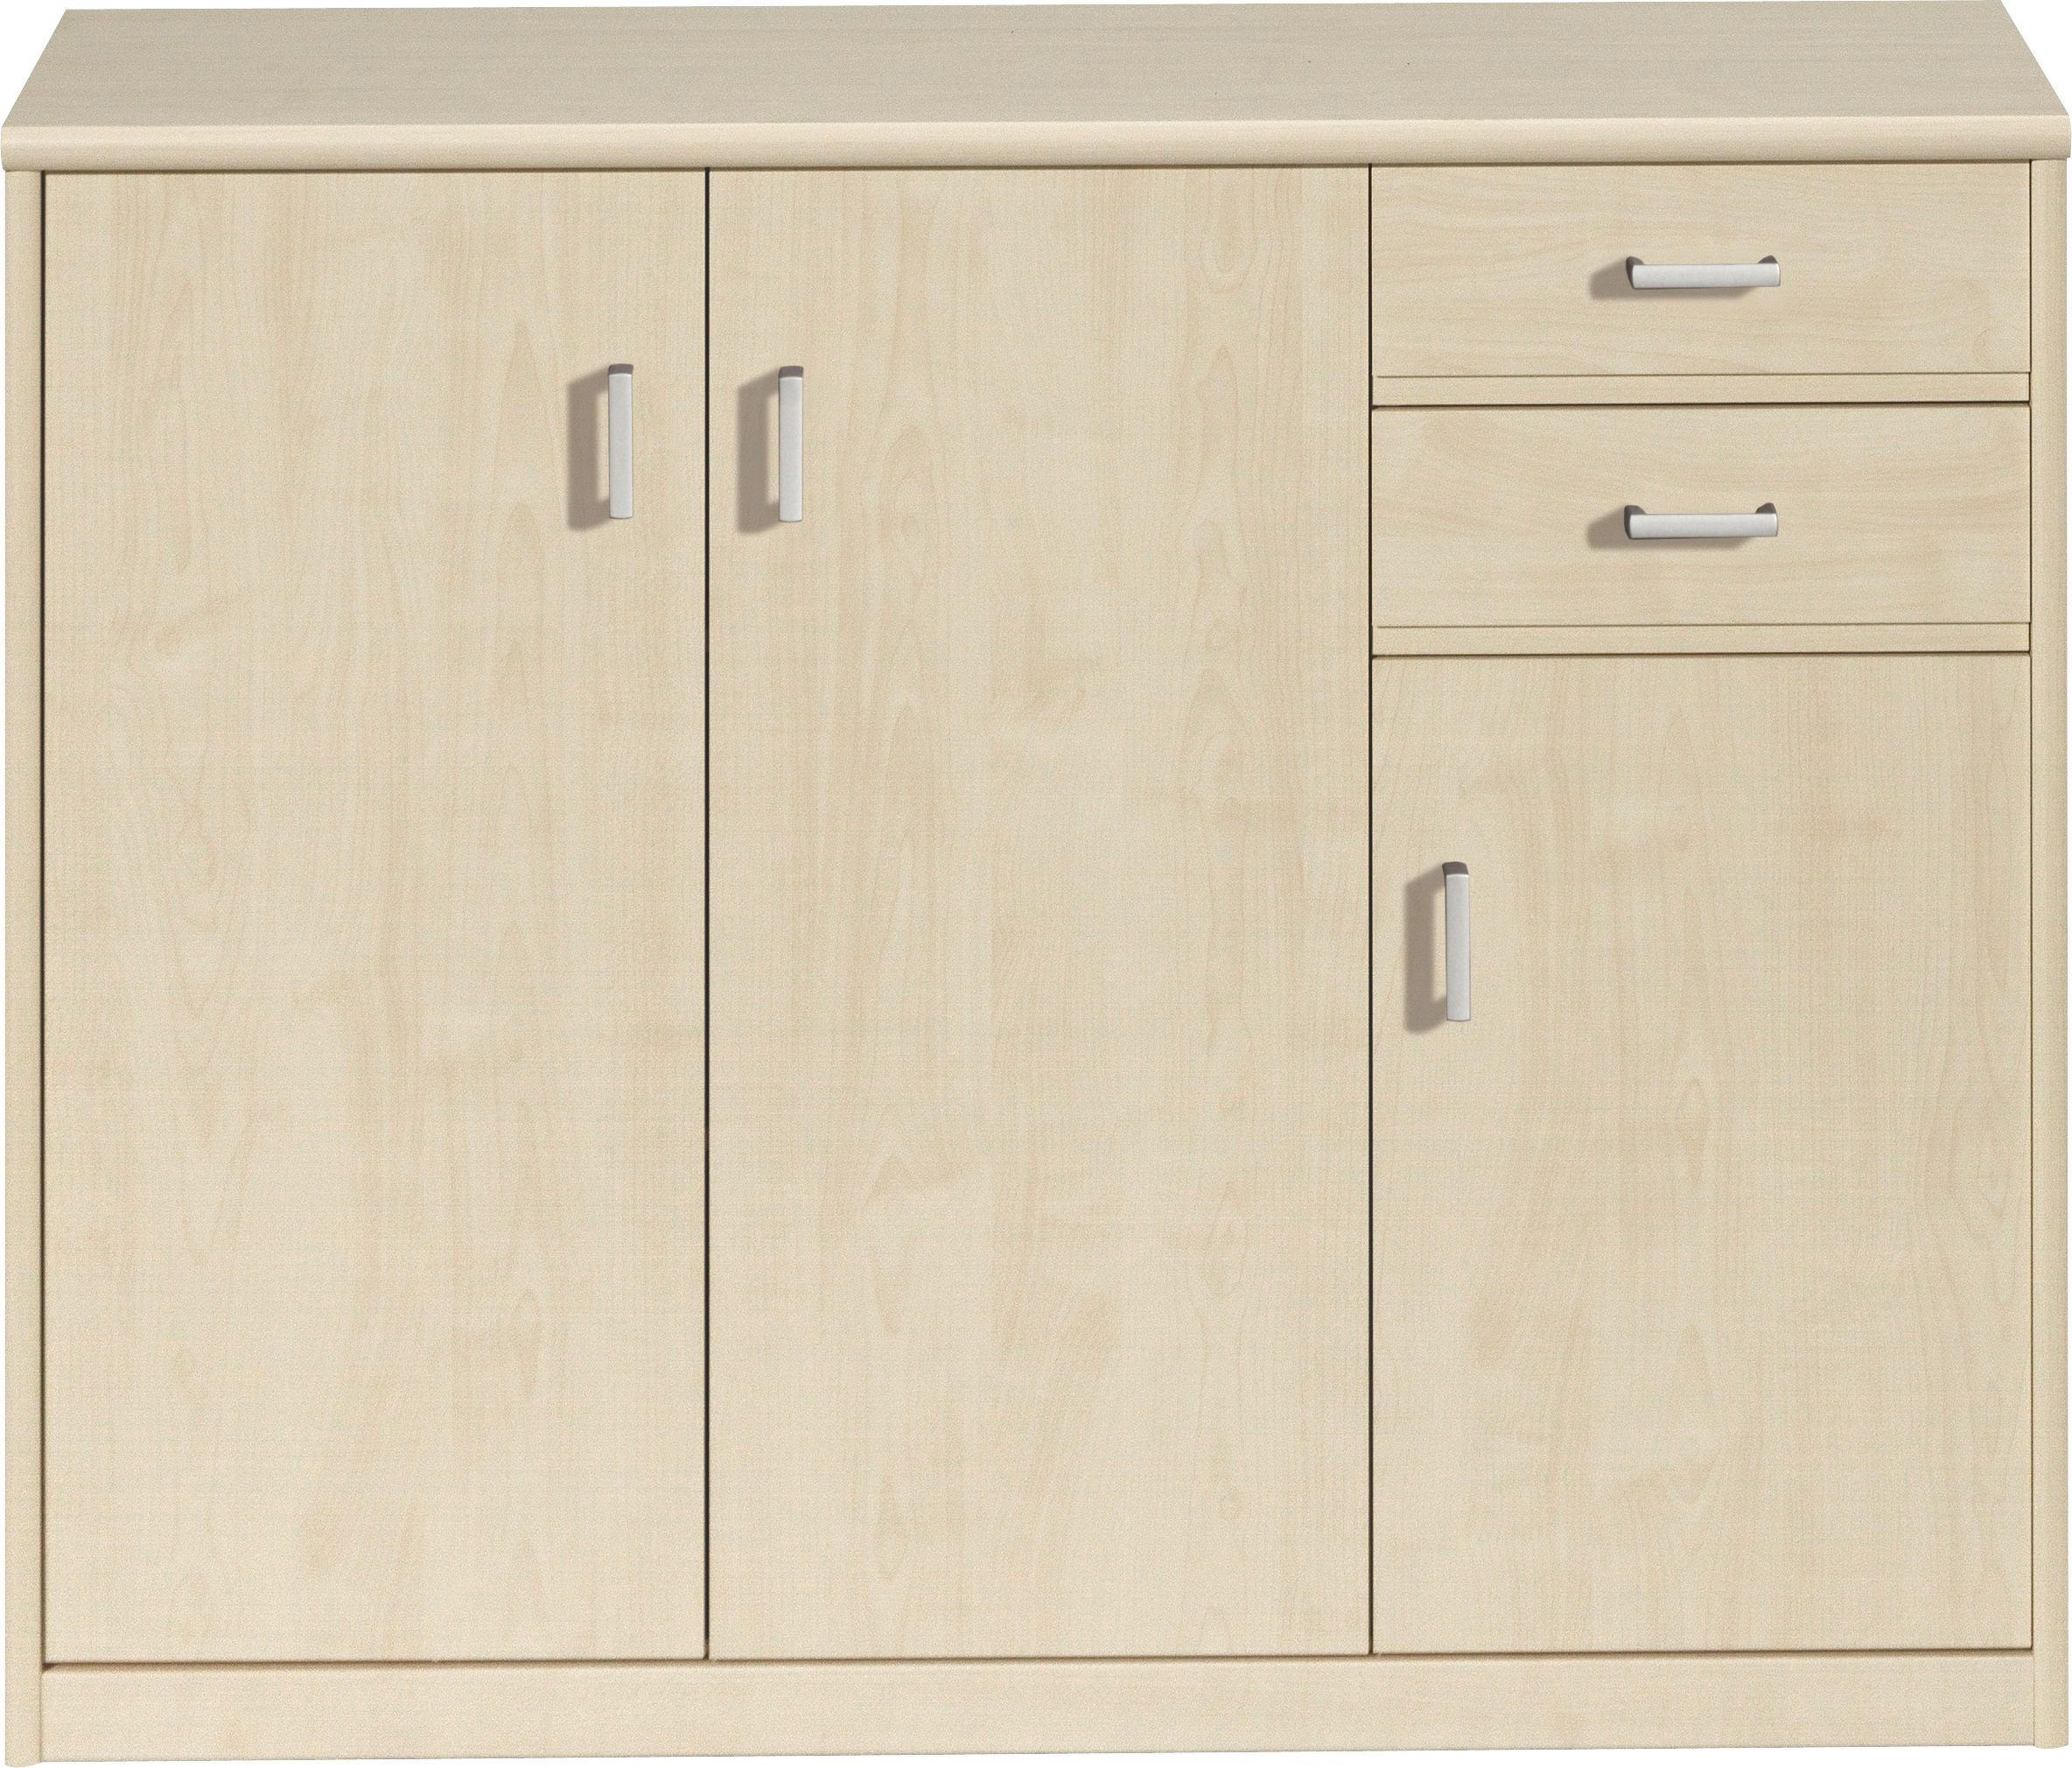 KOMMODE in Ahornfarben - Ahornfarben/Alufarben, KONVENTIONELL, Holzwerkstoff/Kunststoff (106/84/36cm) - CS SCHMAL